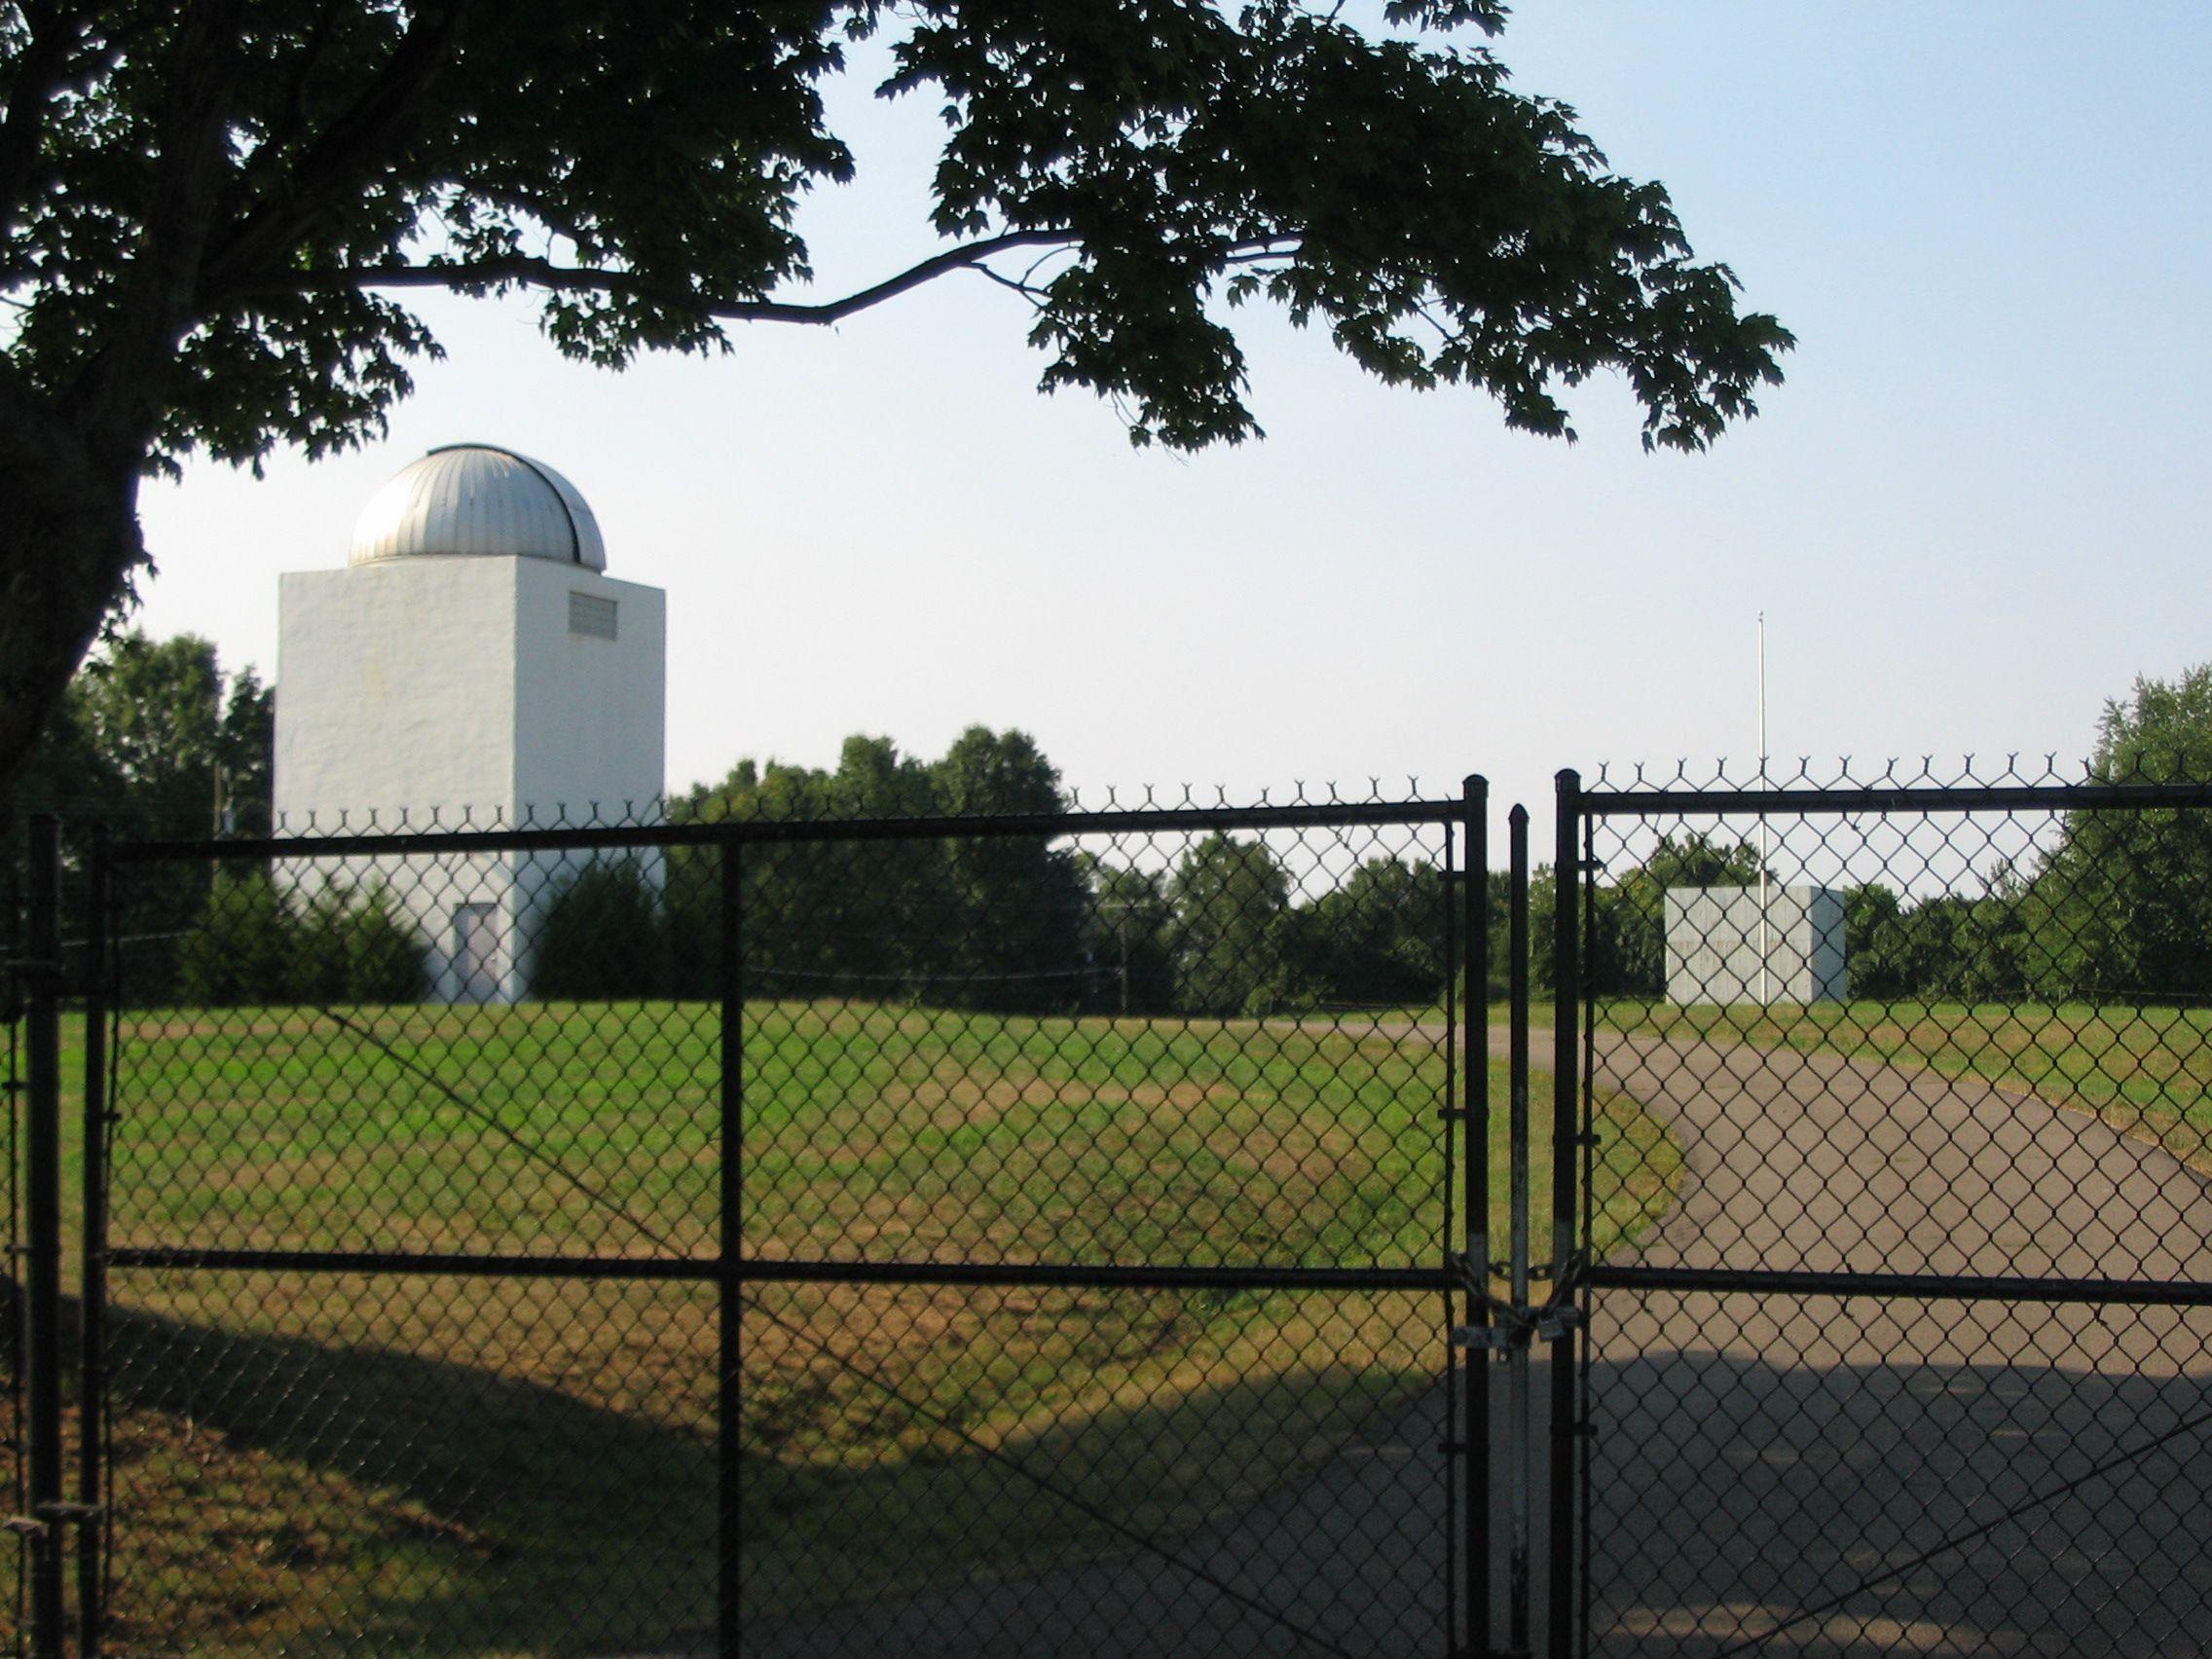 Radio and radar buildings at Turner Farm County Park by Craig Swain on hmdb.org (reproduced under Fair Use)